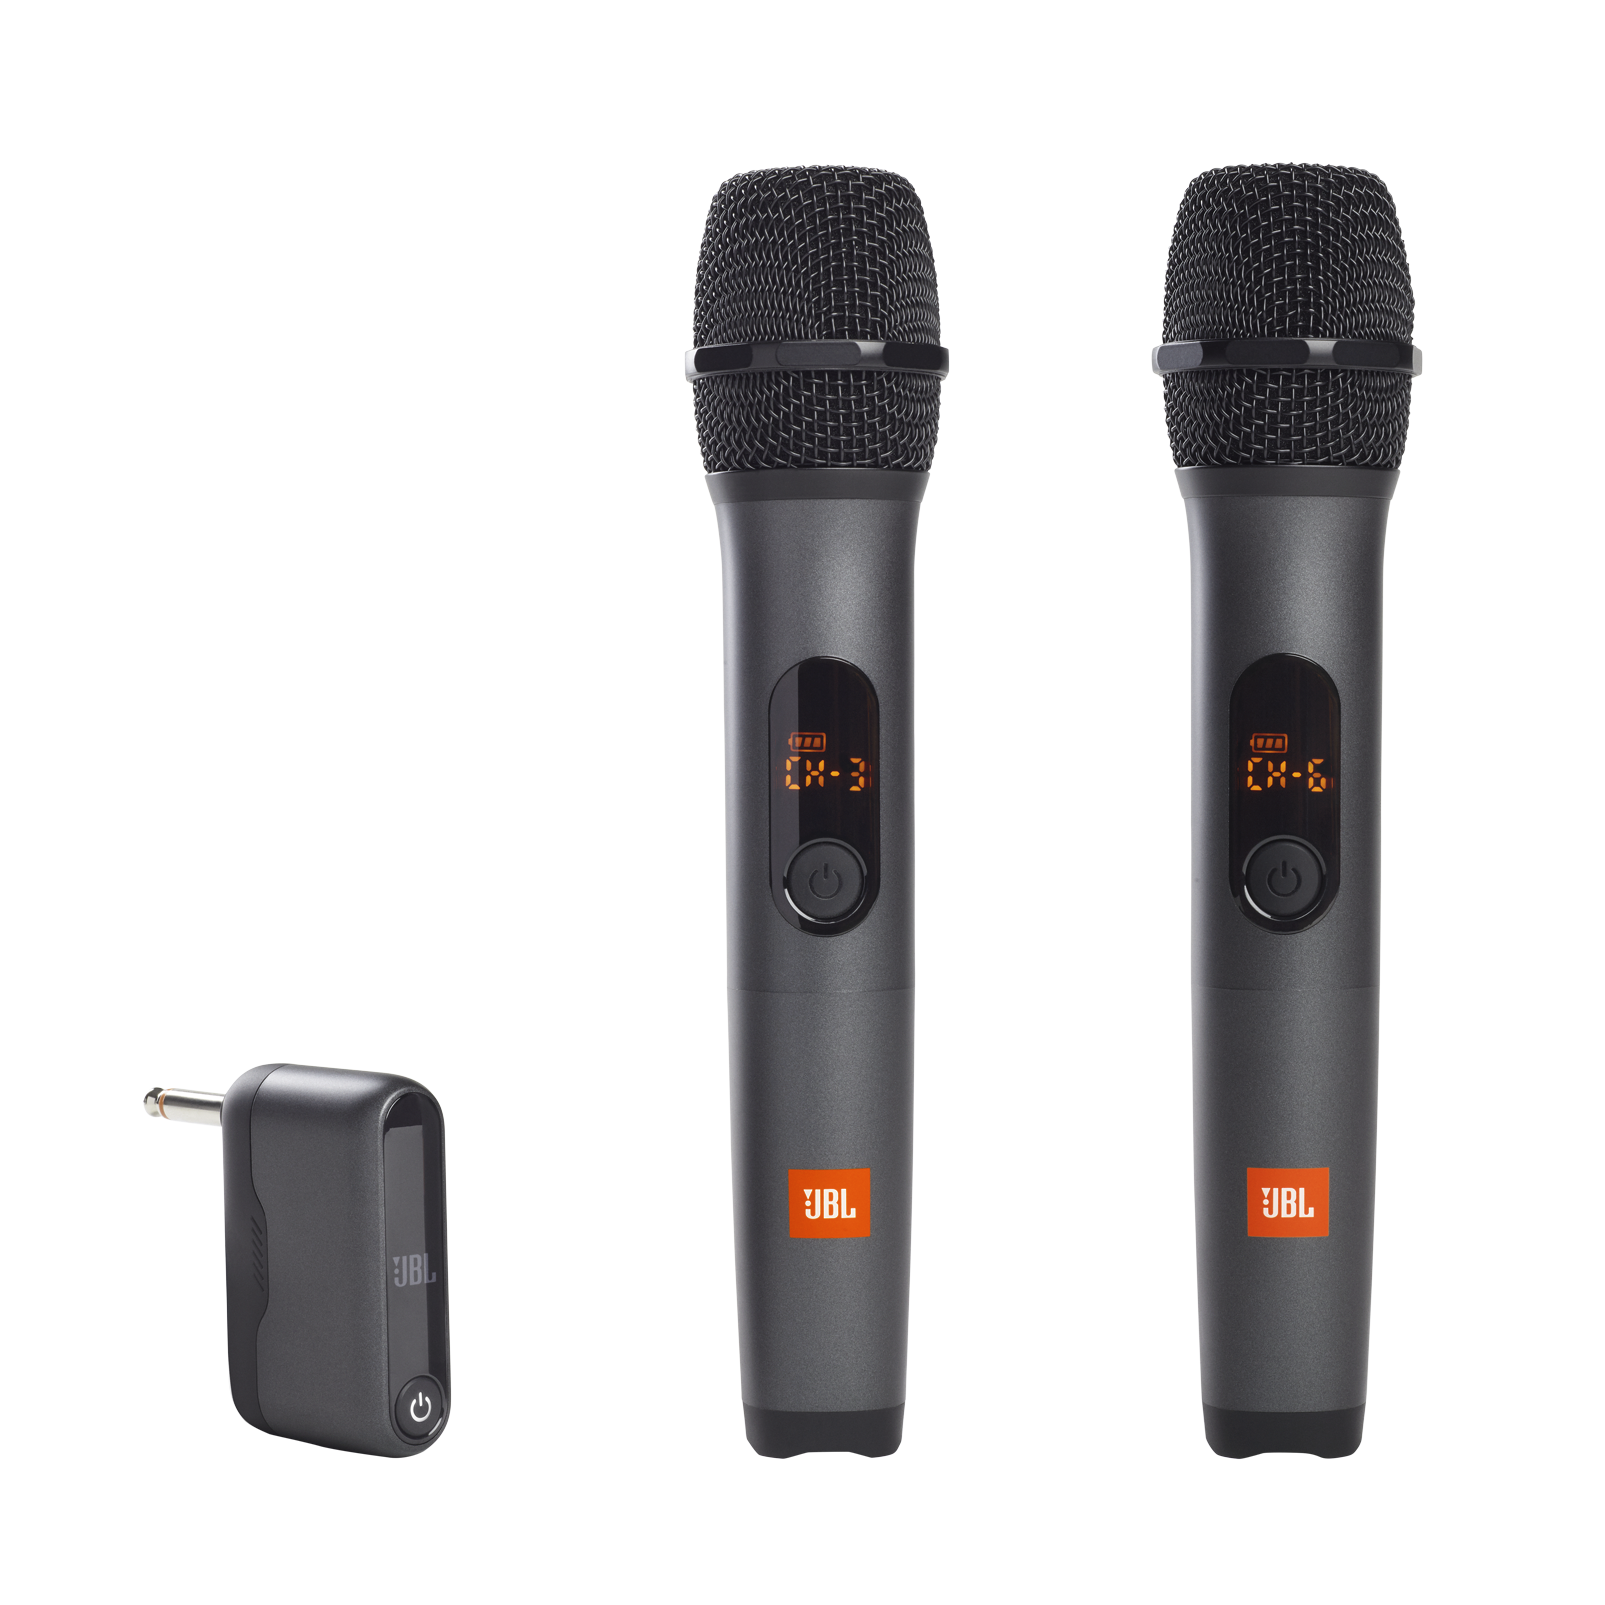 JBL Wireless Microphone Set - Black - Wireless two microphone system - Hero